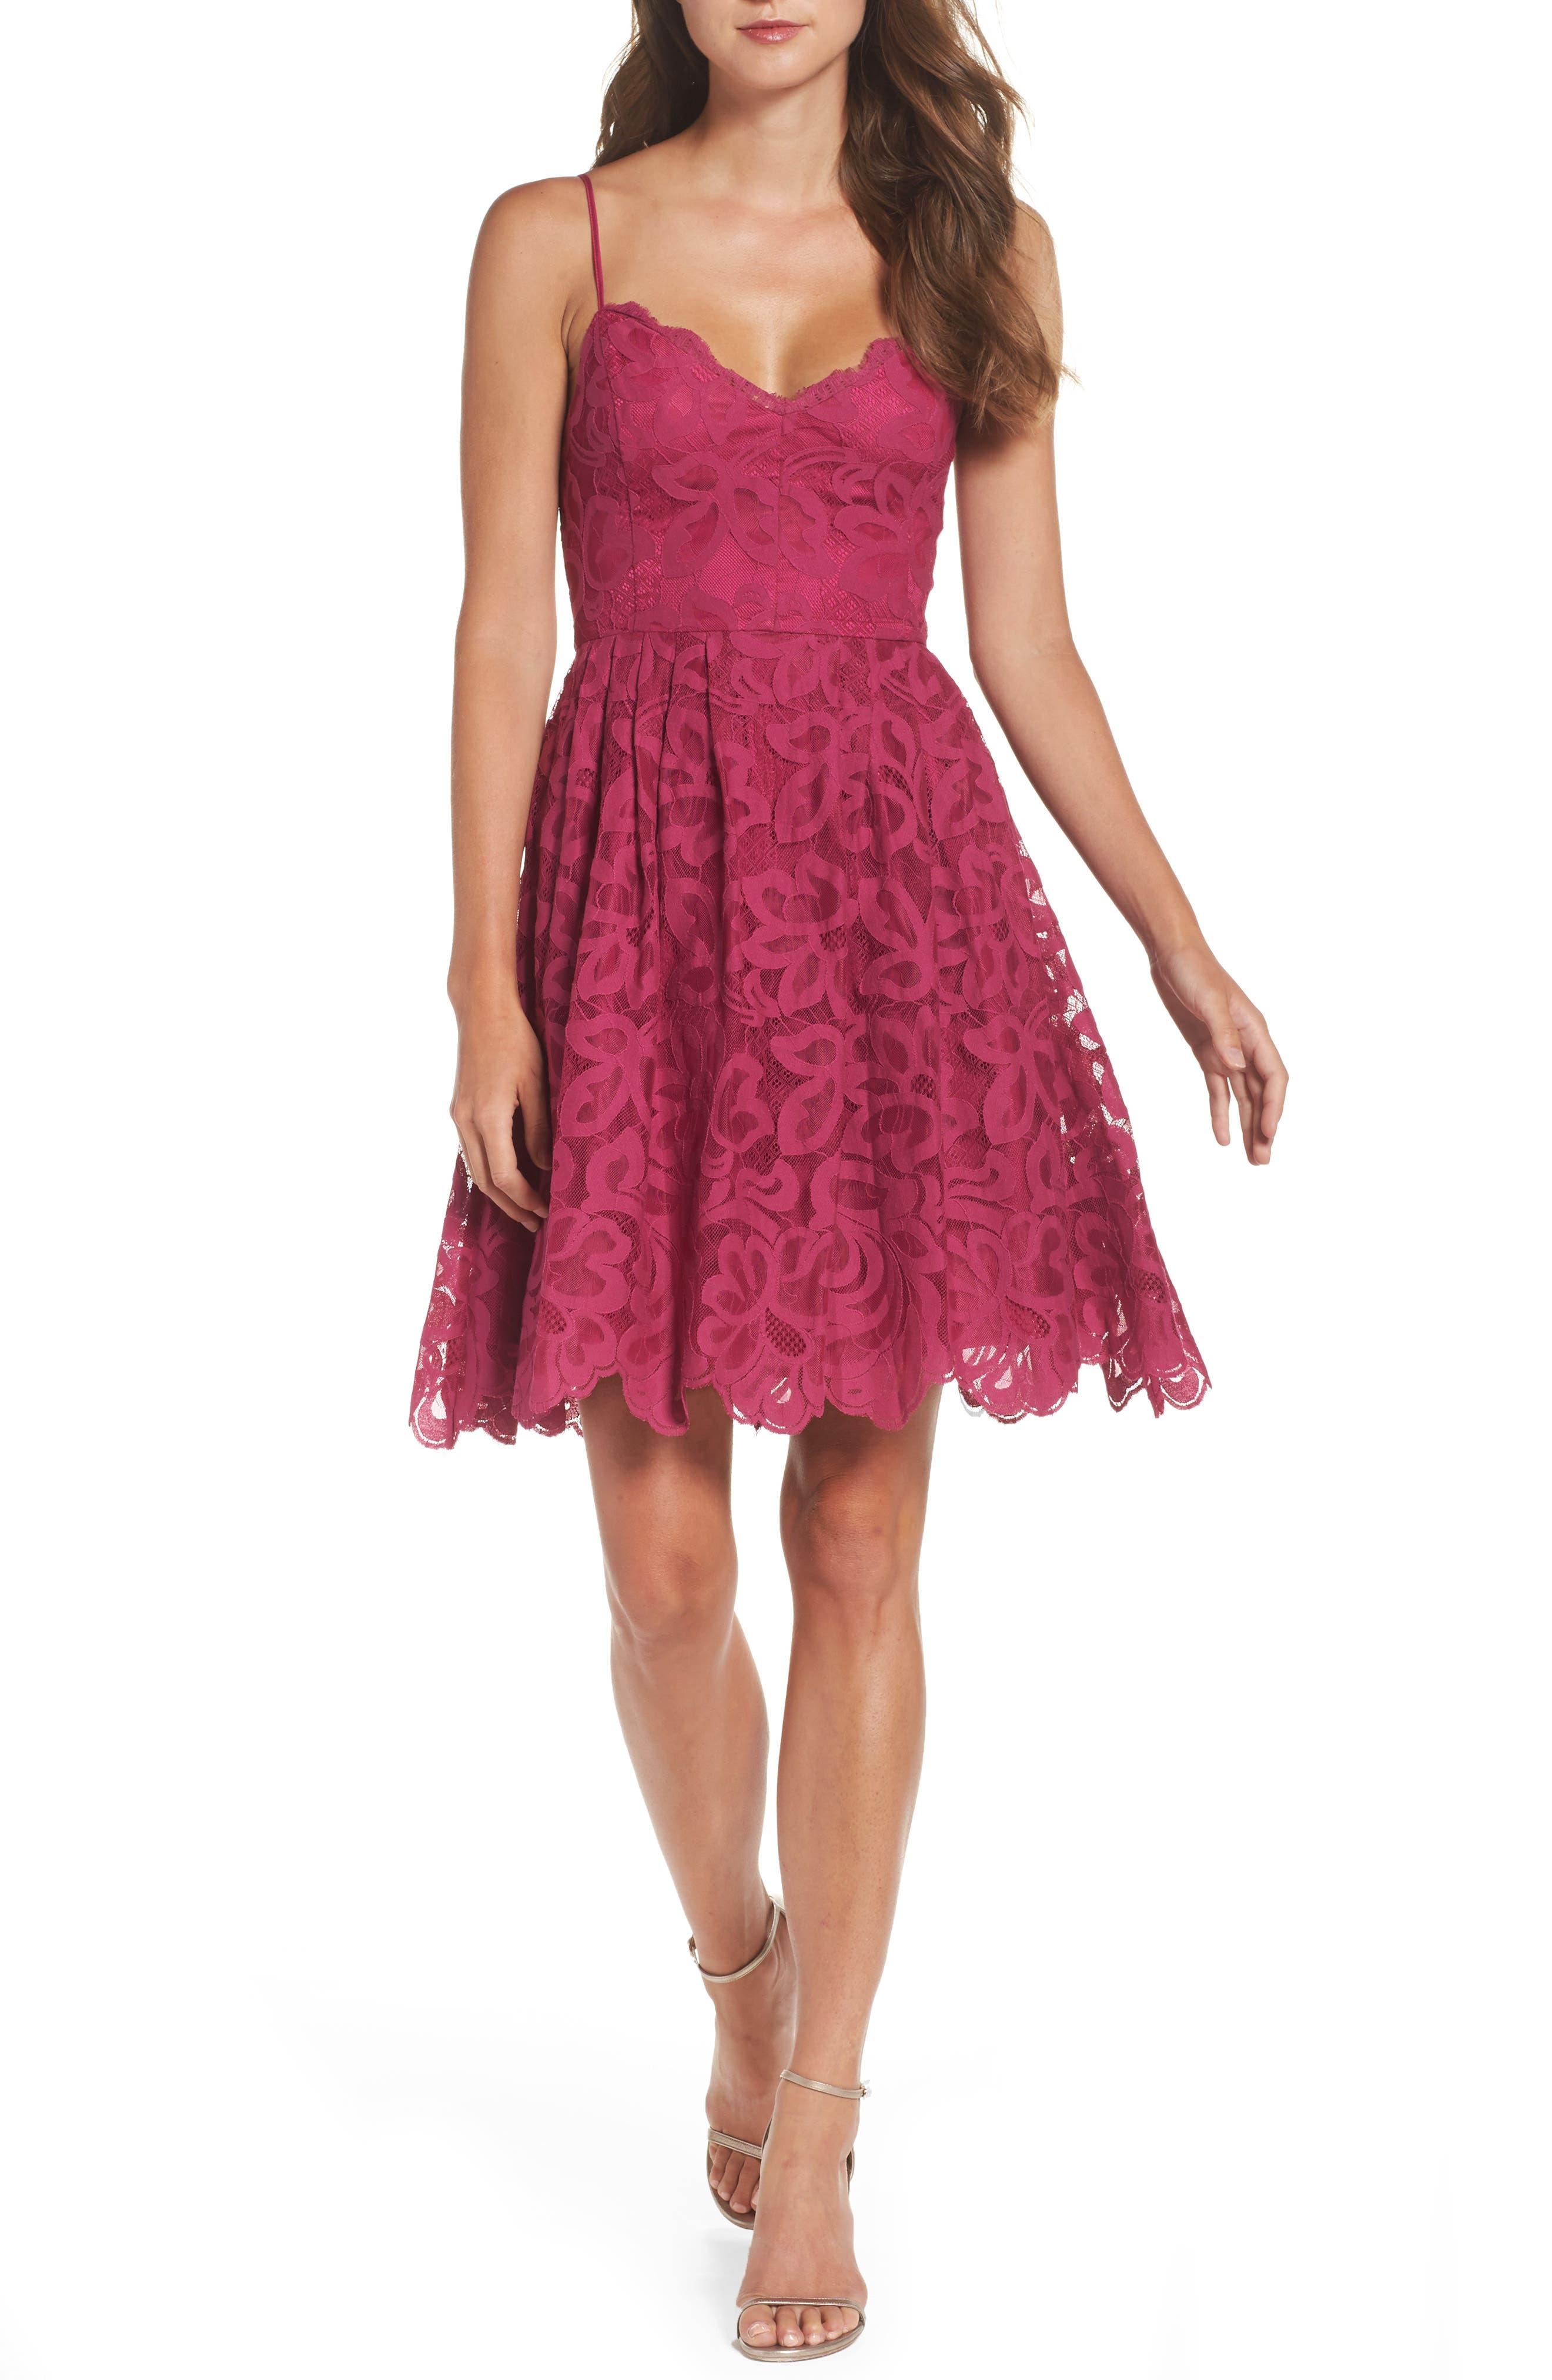 Alternate Image 1 Selected - BB Dakota Occasion Celeste Scalloped Lace Fit & Flare Dress